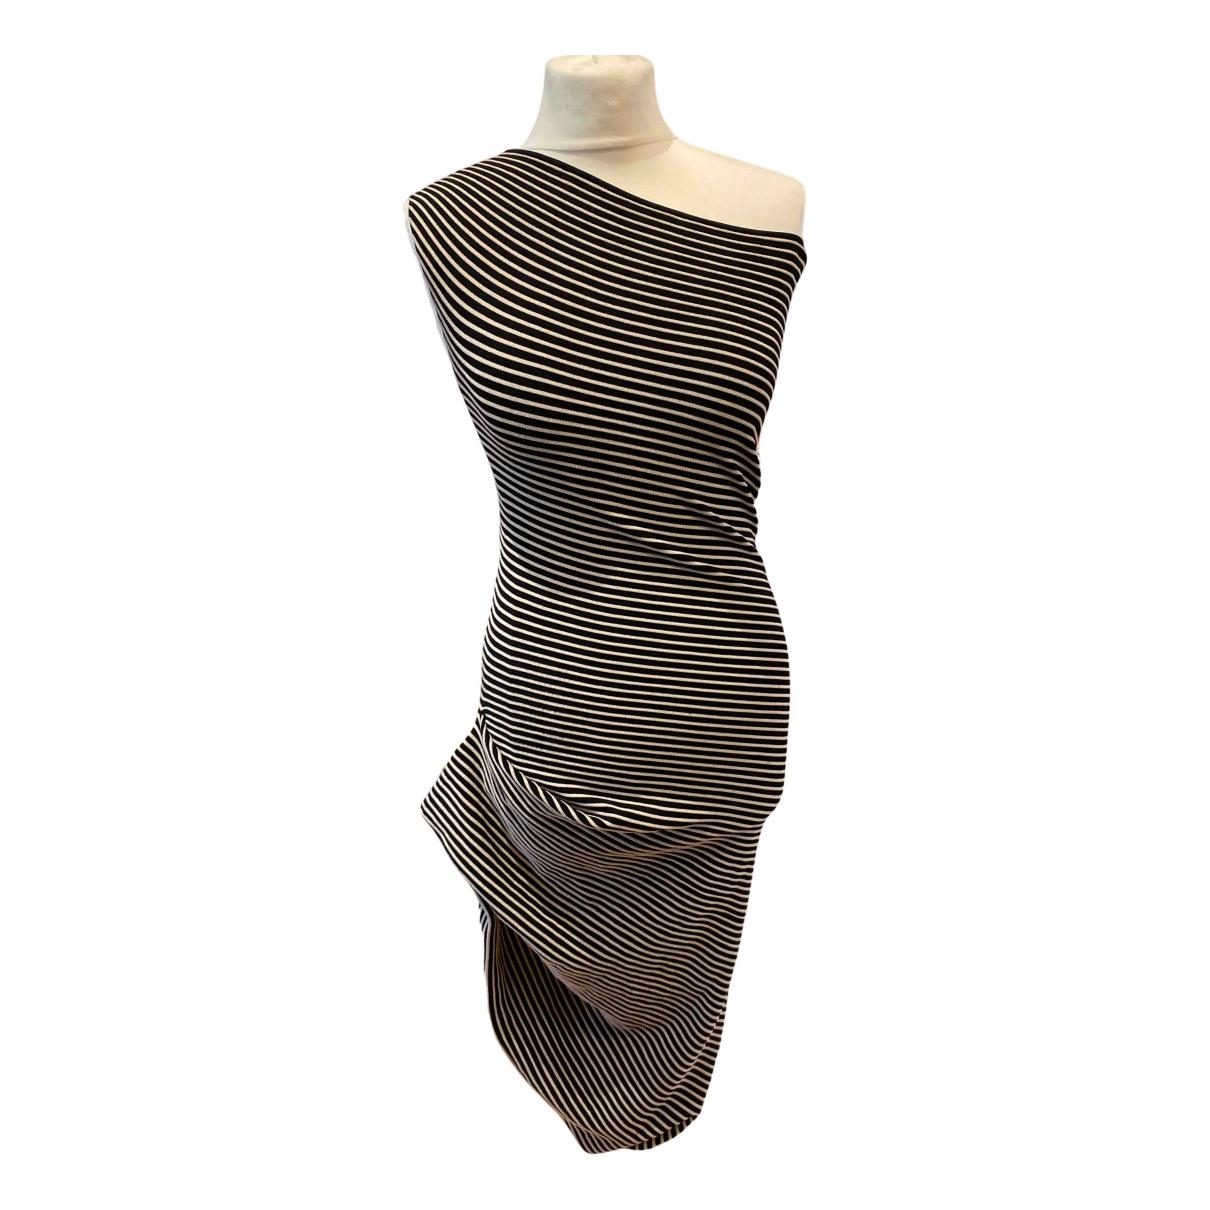 Roland Mouret \N Multicolour Cotton - elasthane dress for Women 14 UK